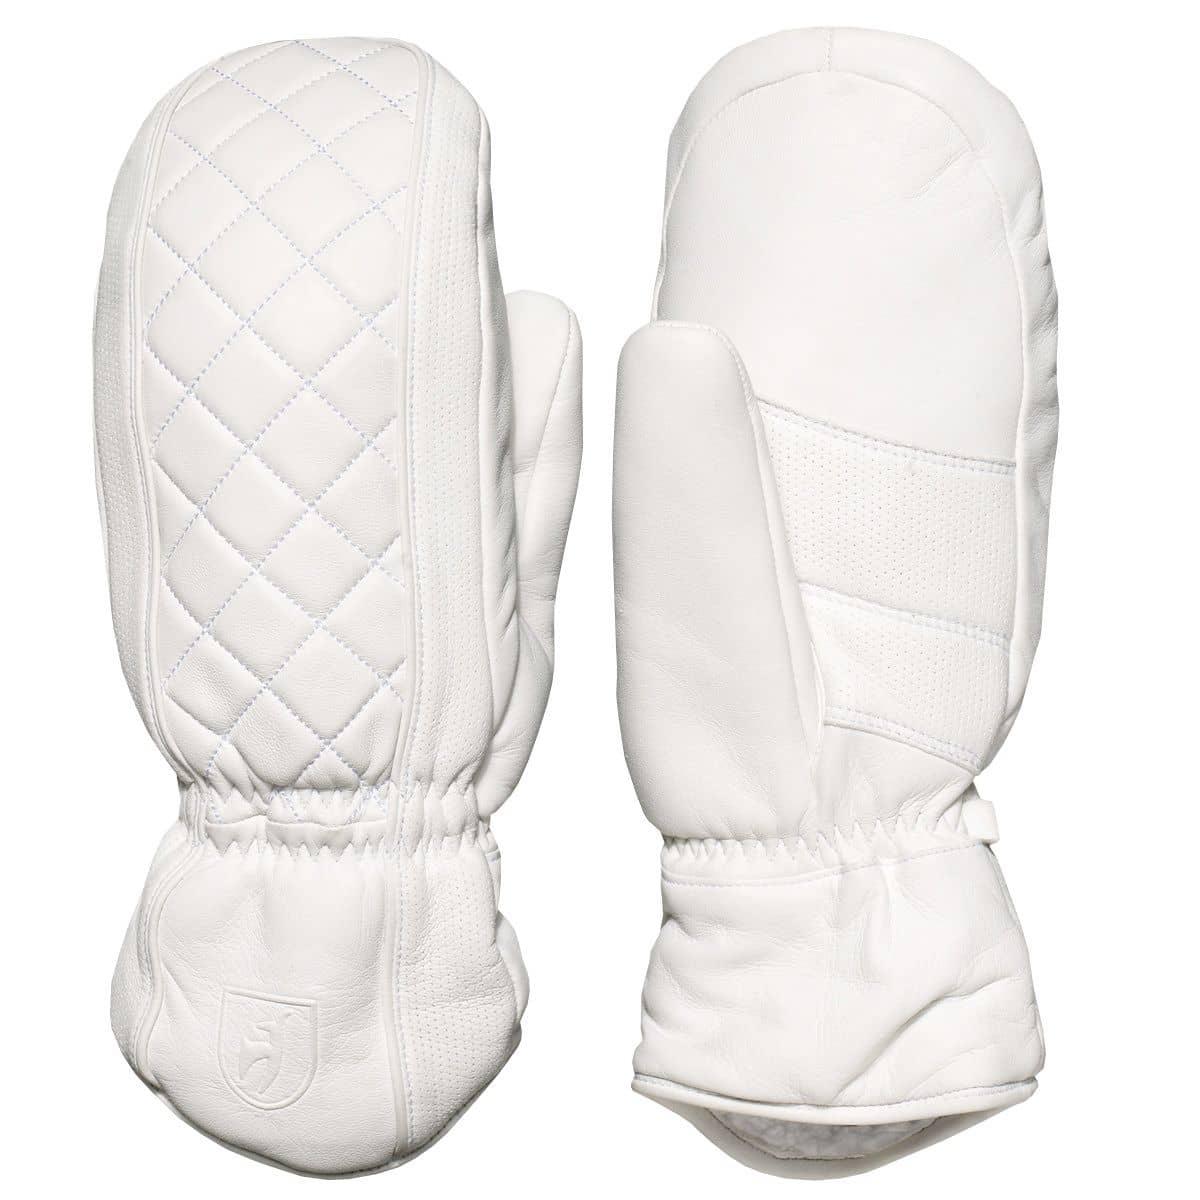 Toni Sailer Lizzy Glove bright white